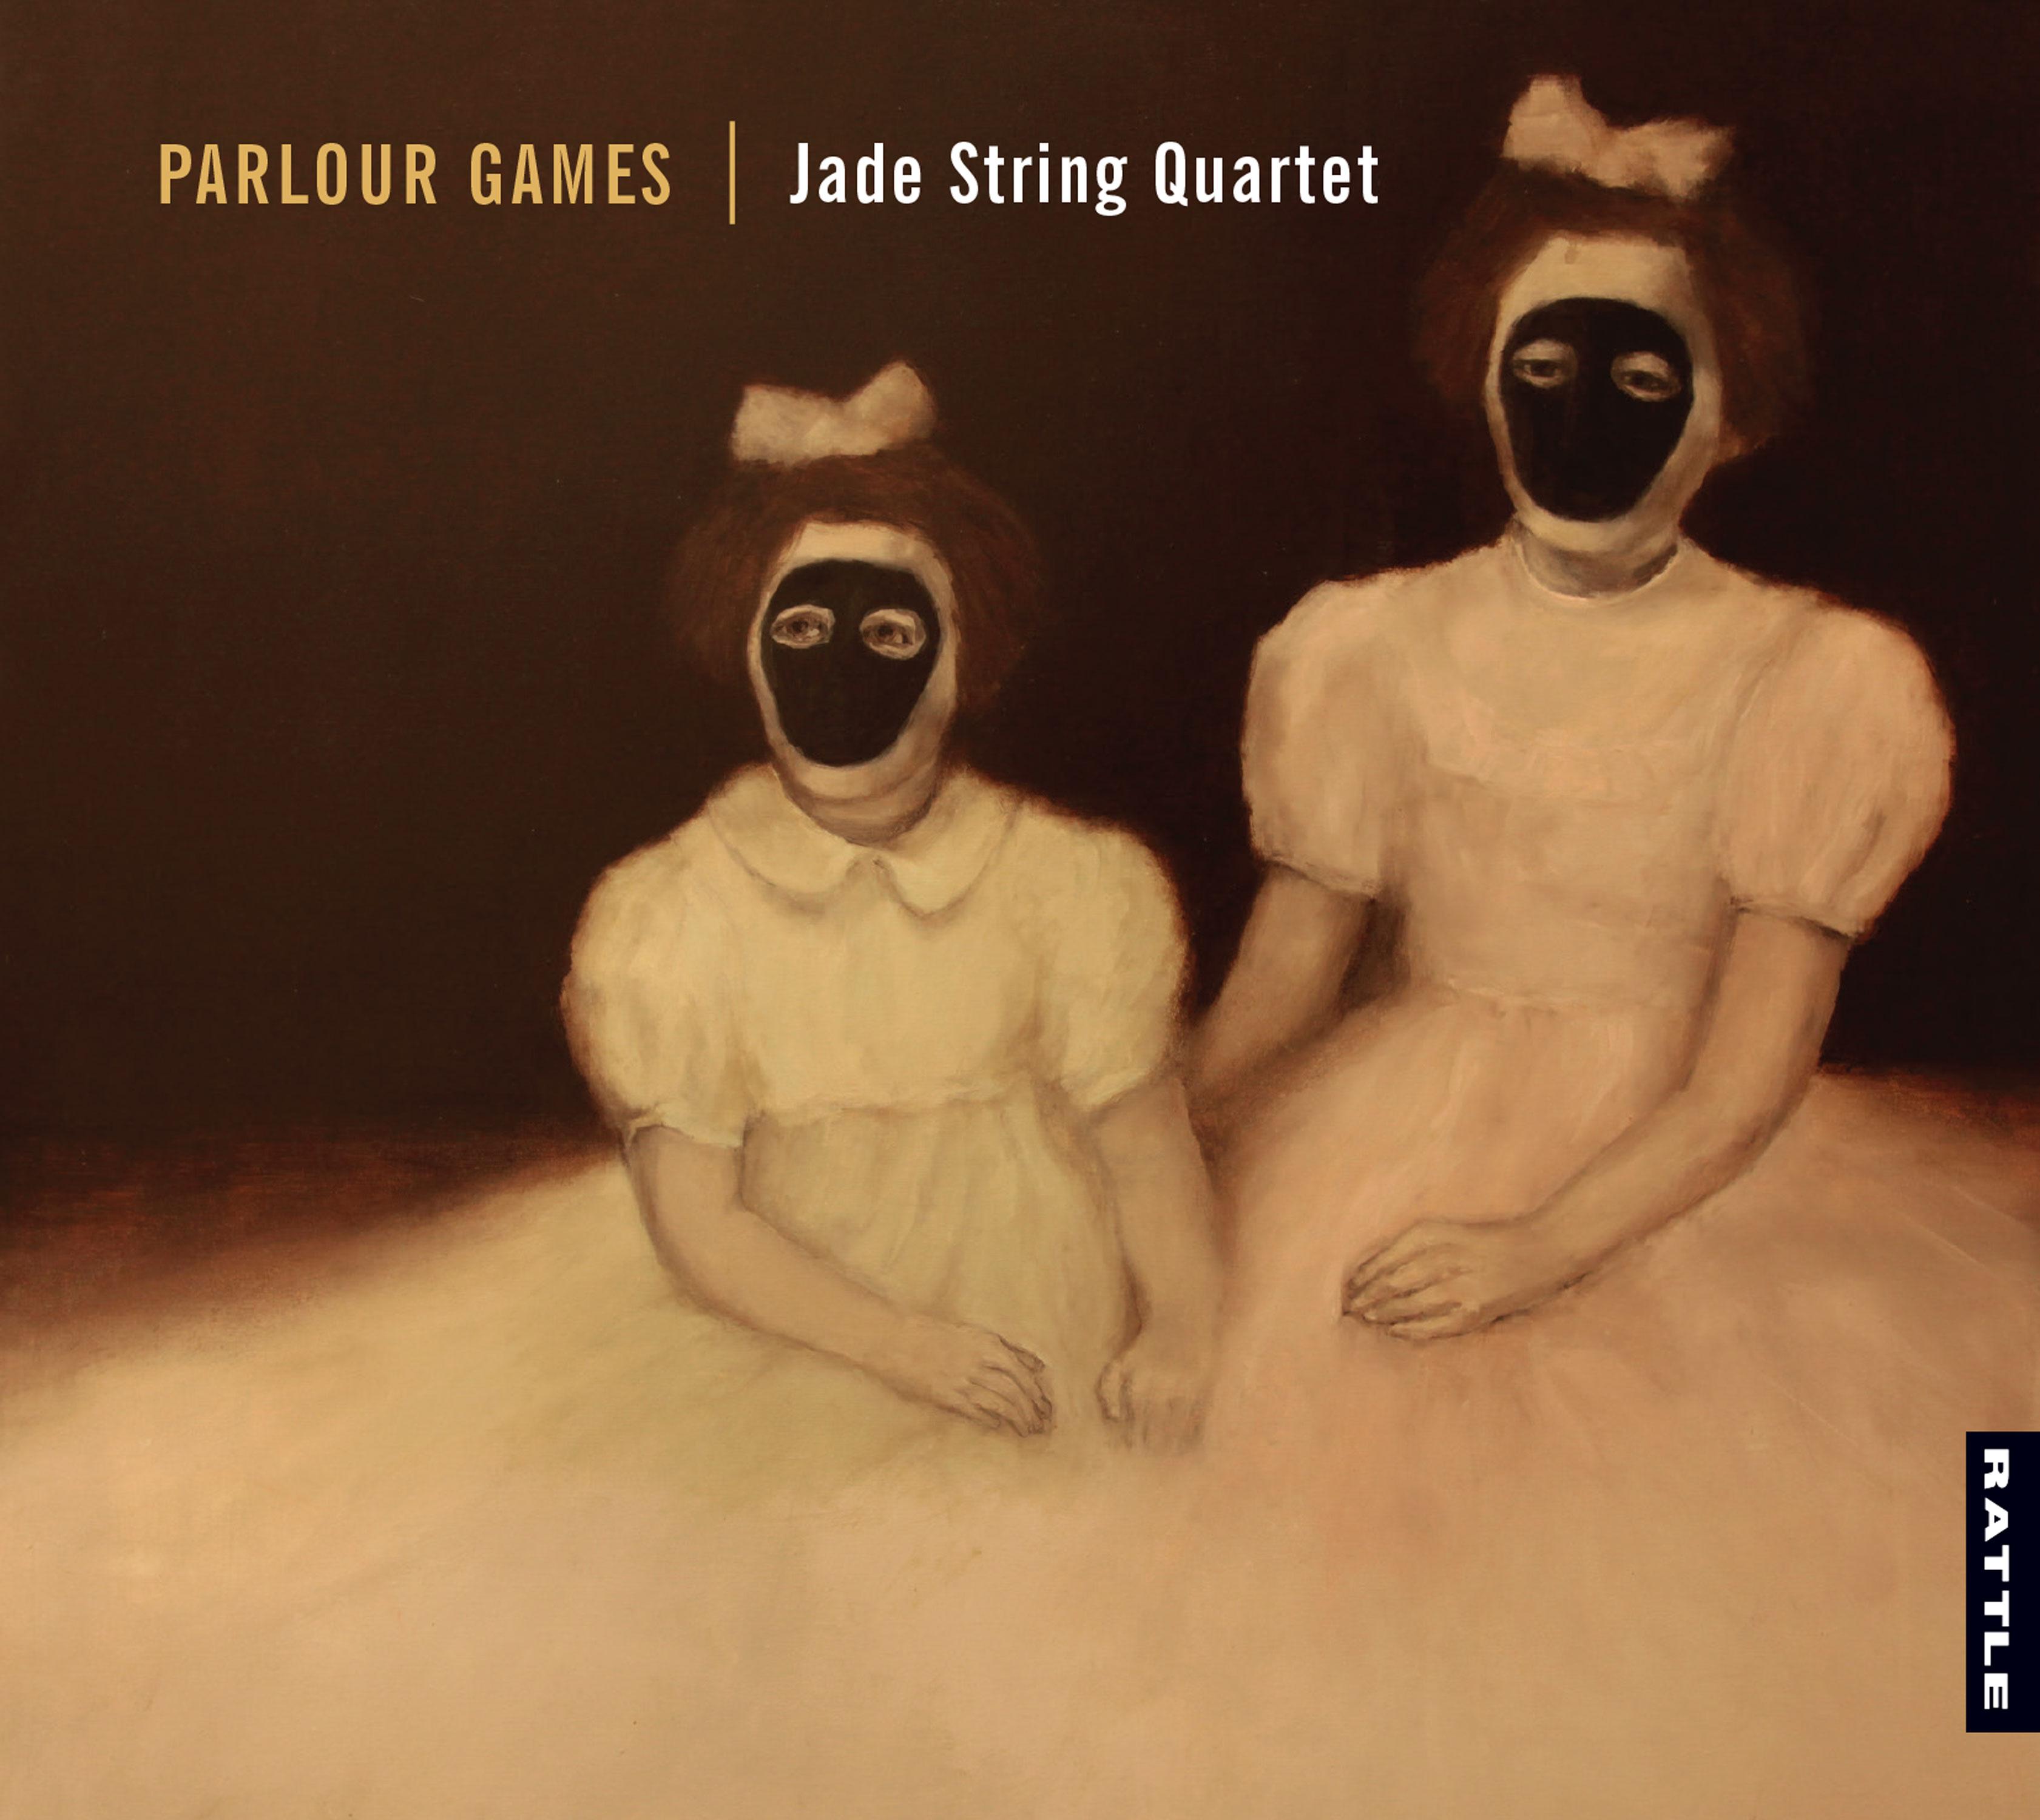 Jade String Quartet | Parlour Games - downloadable MP3 ALBUM